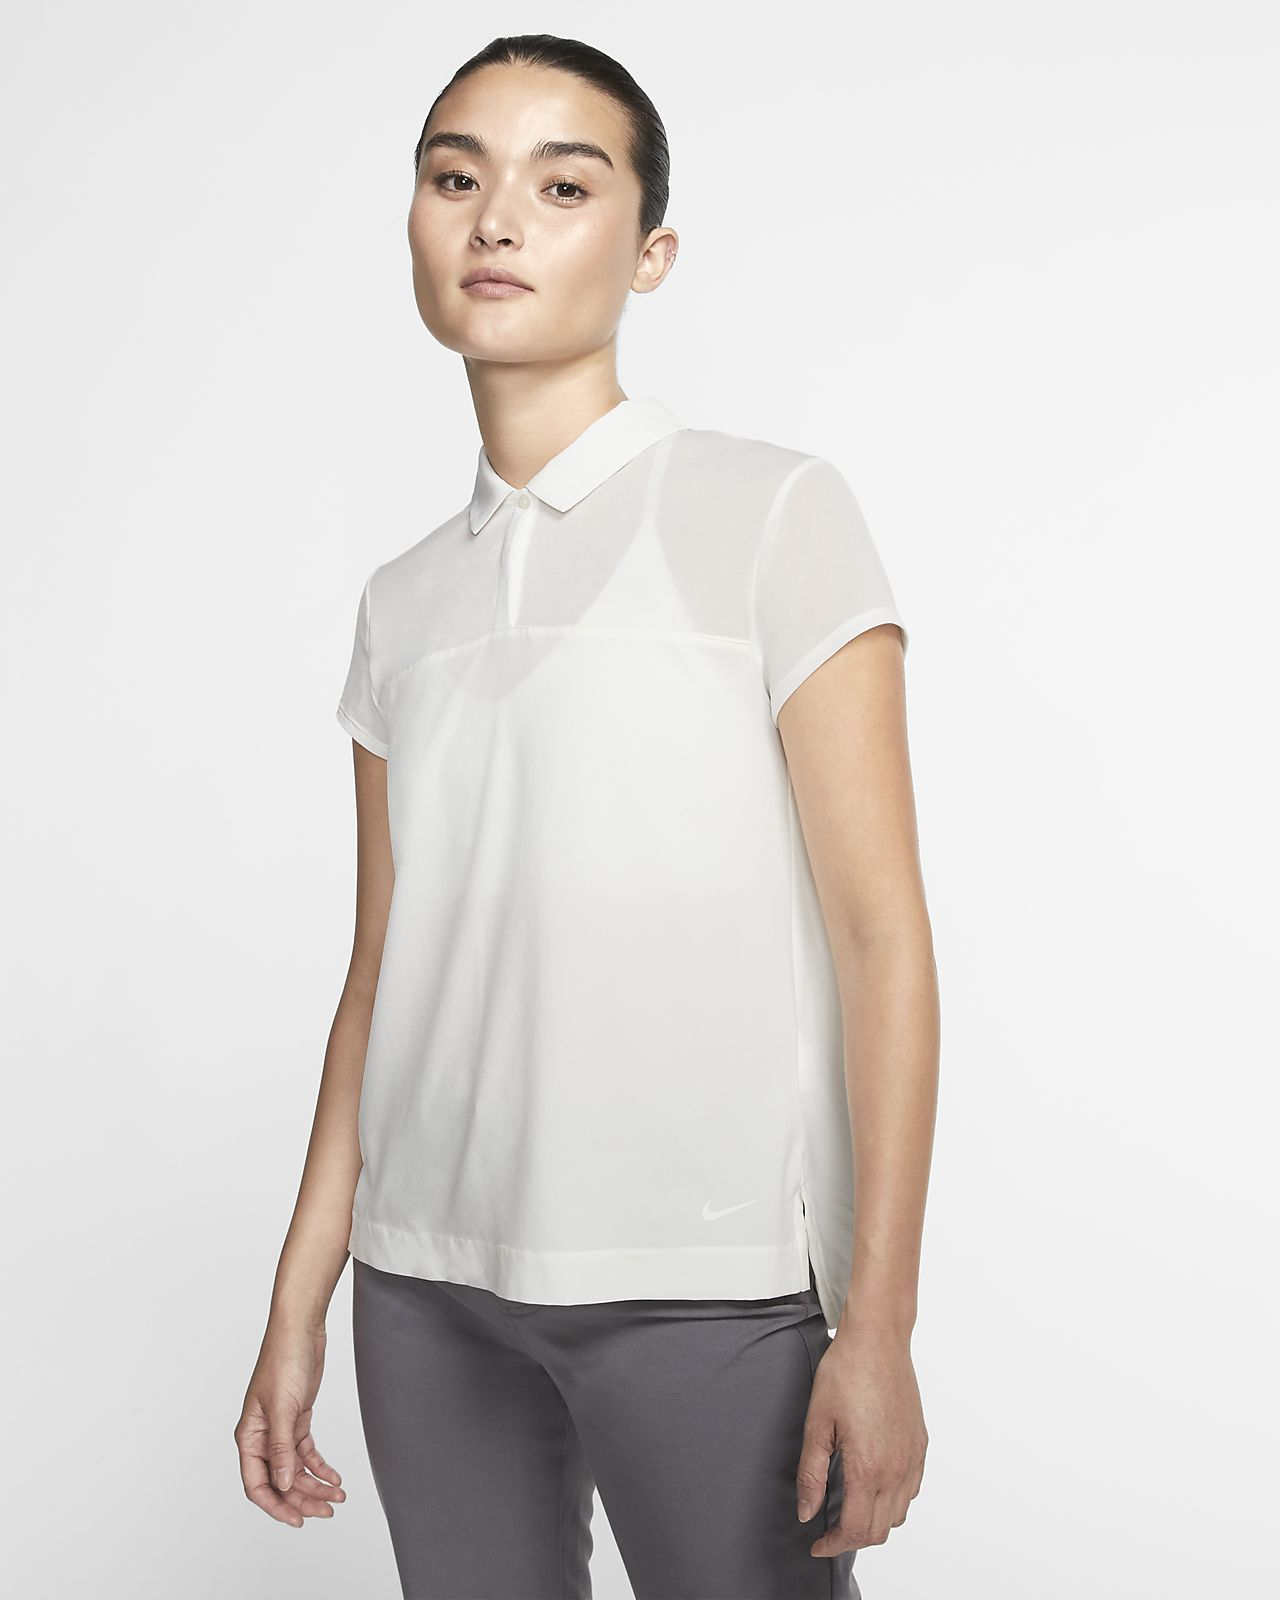 Nike Flex-golfpolo til kvinder